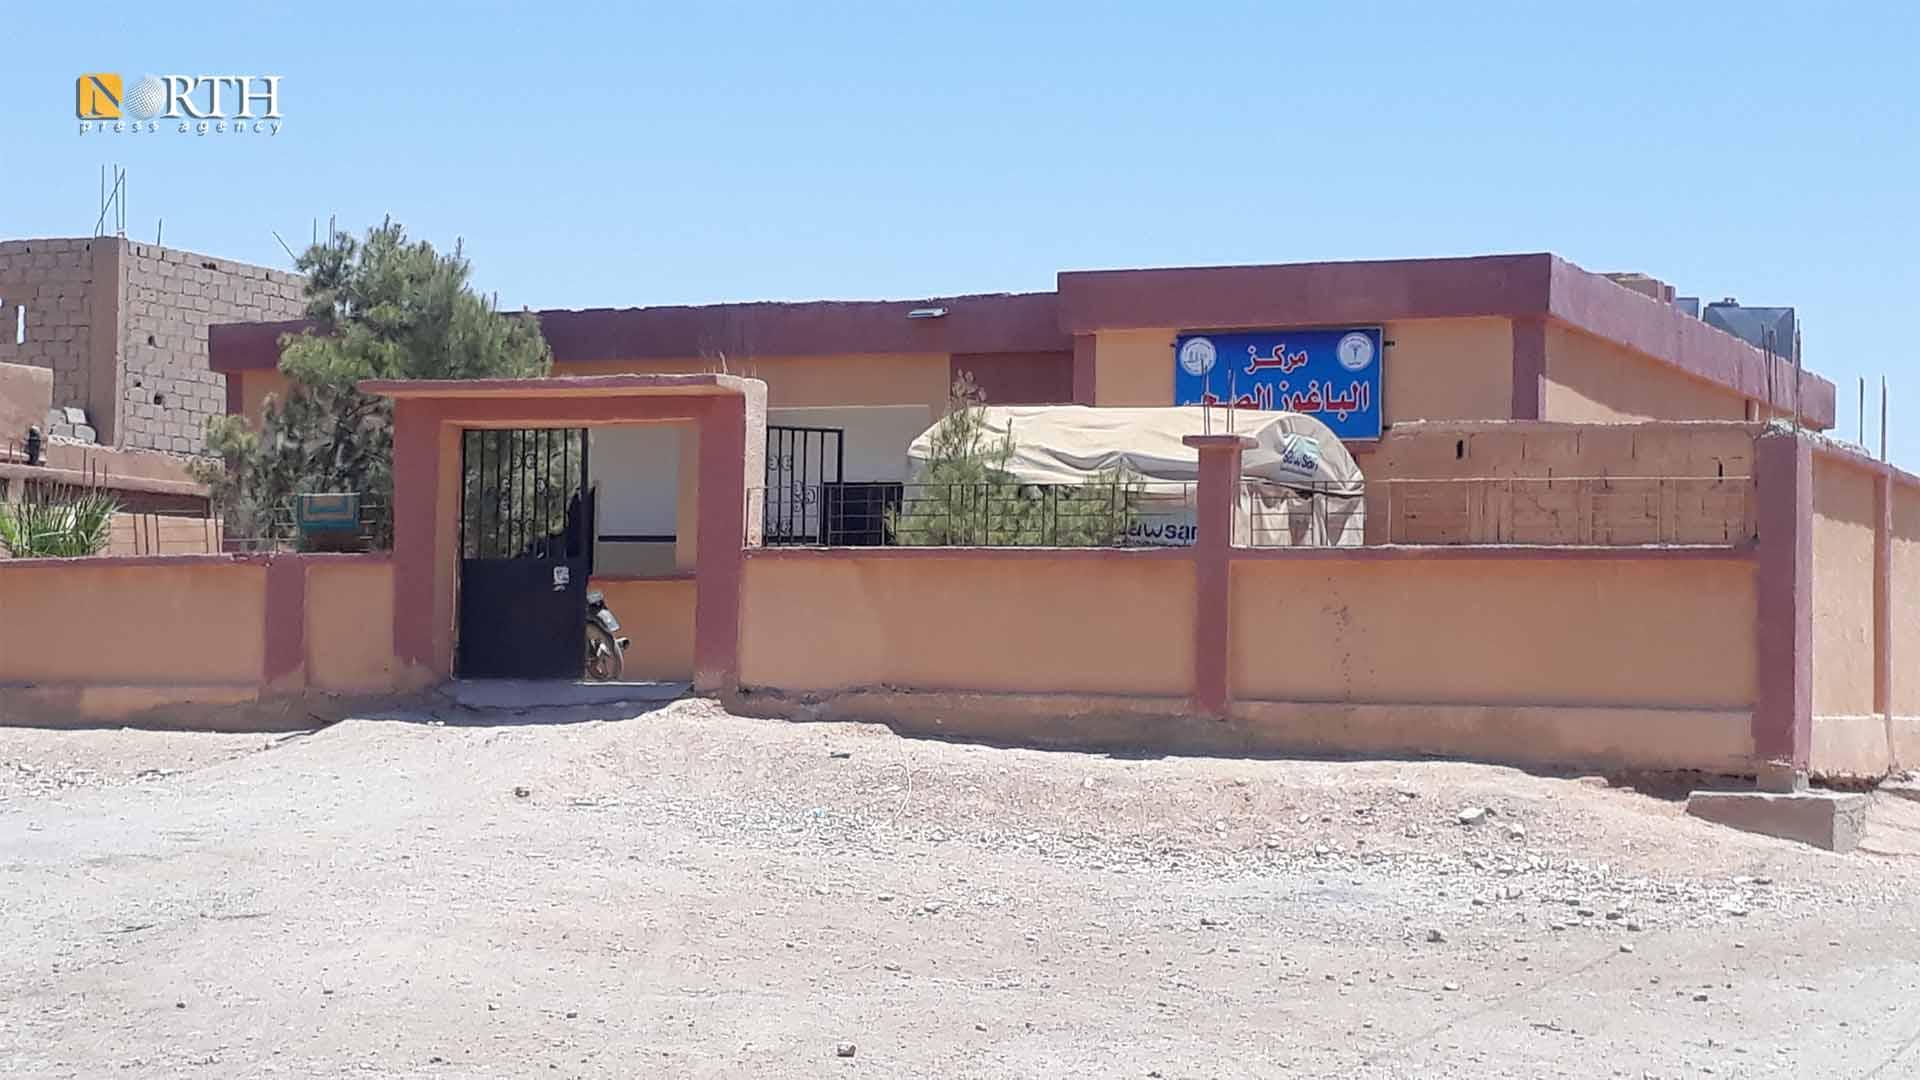 Health Center in al-Baghouz, east of Deir ez-Zor – North Press